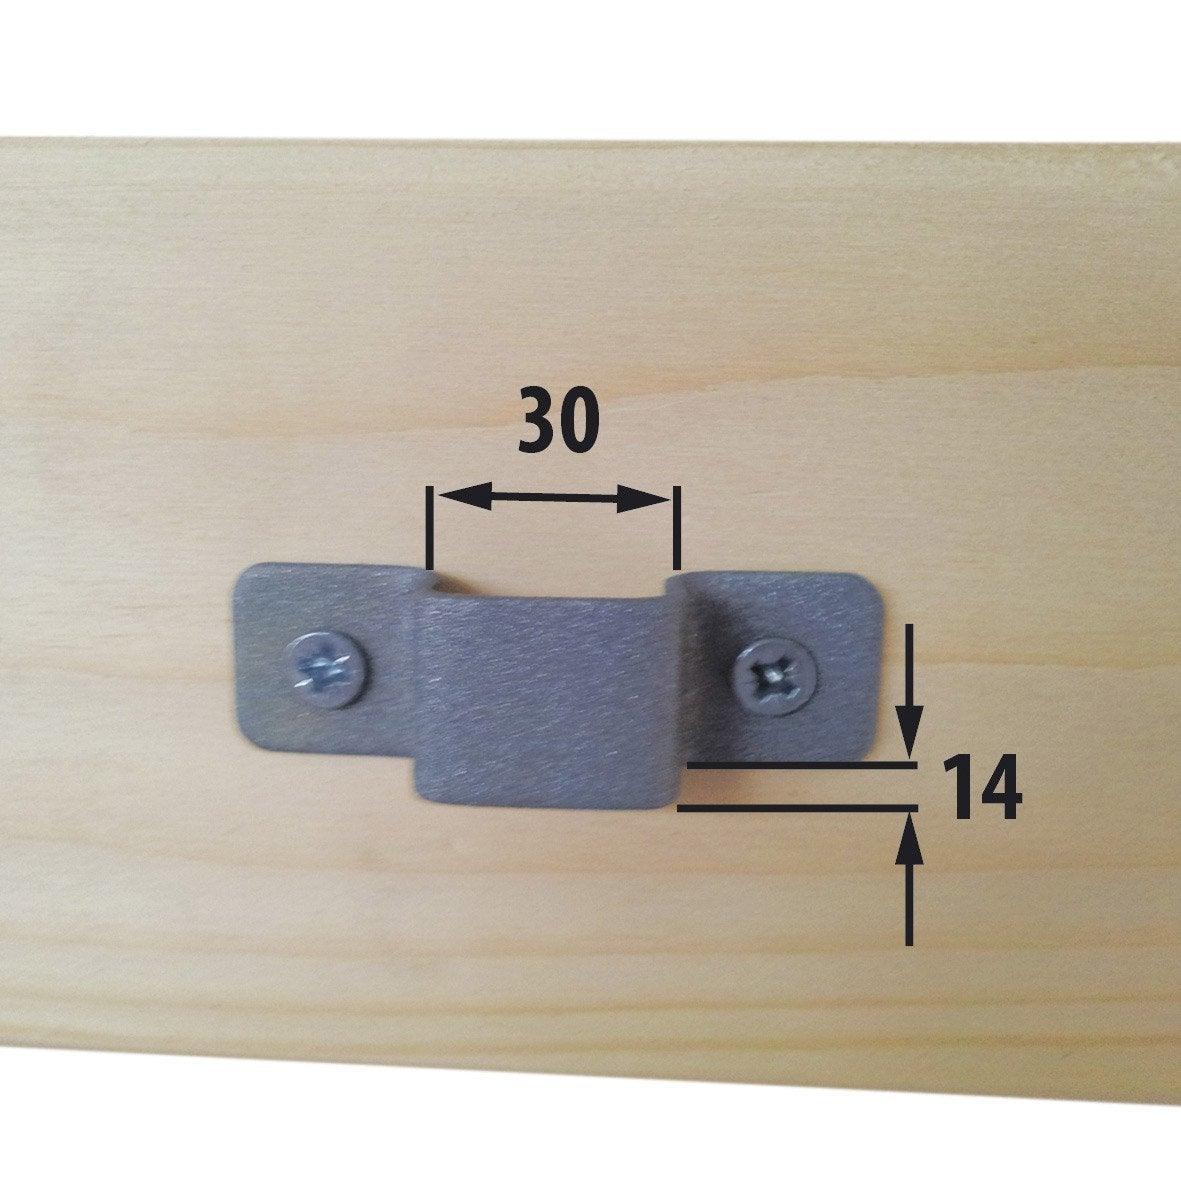 gache pour verrou 30 x 14 mm leroy merlin. Black Bedroom Furniture Sets. Home Design Ideas